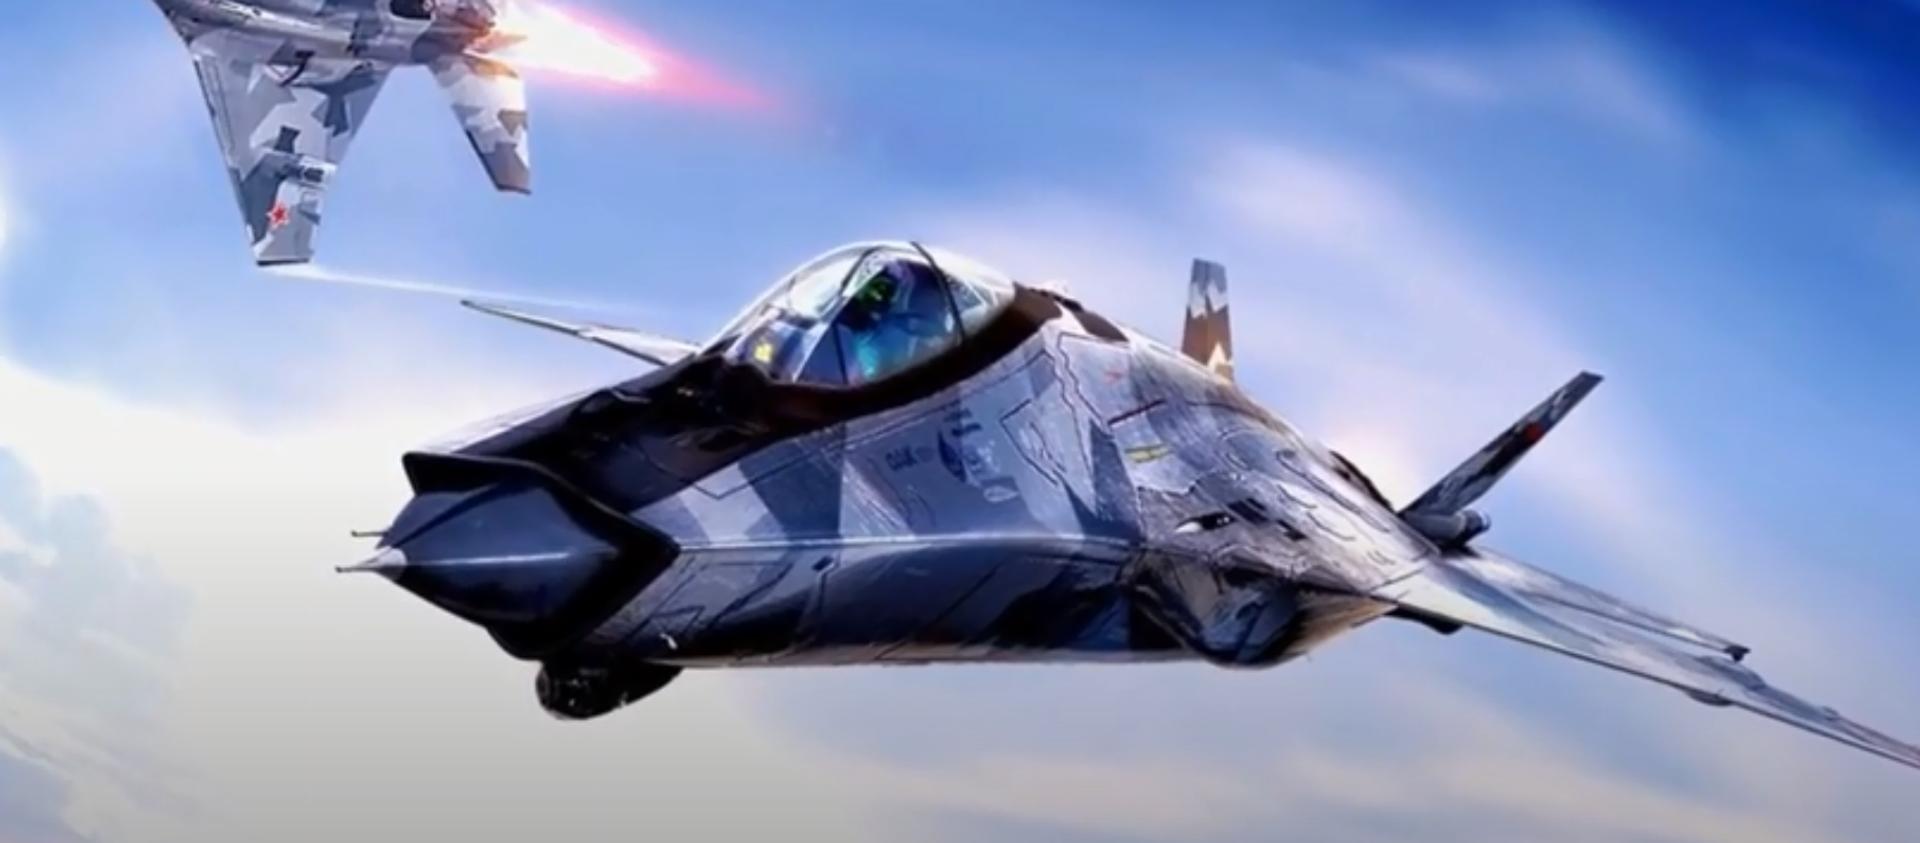 Projektna vizija lovca MiG-41 - Sputnik Srbija, 1920, 24.01.2021